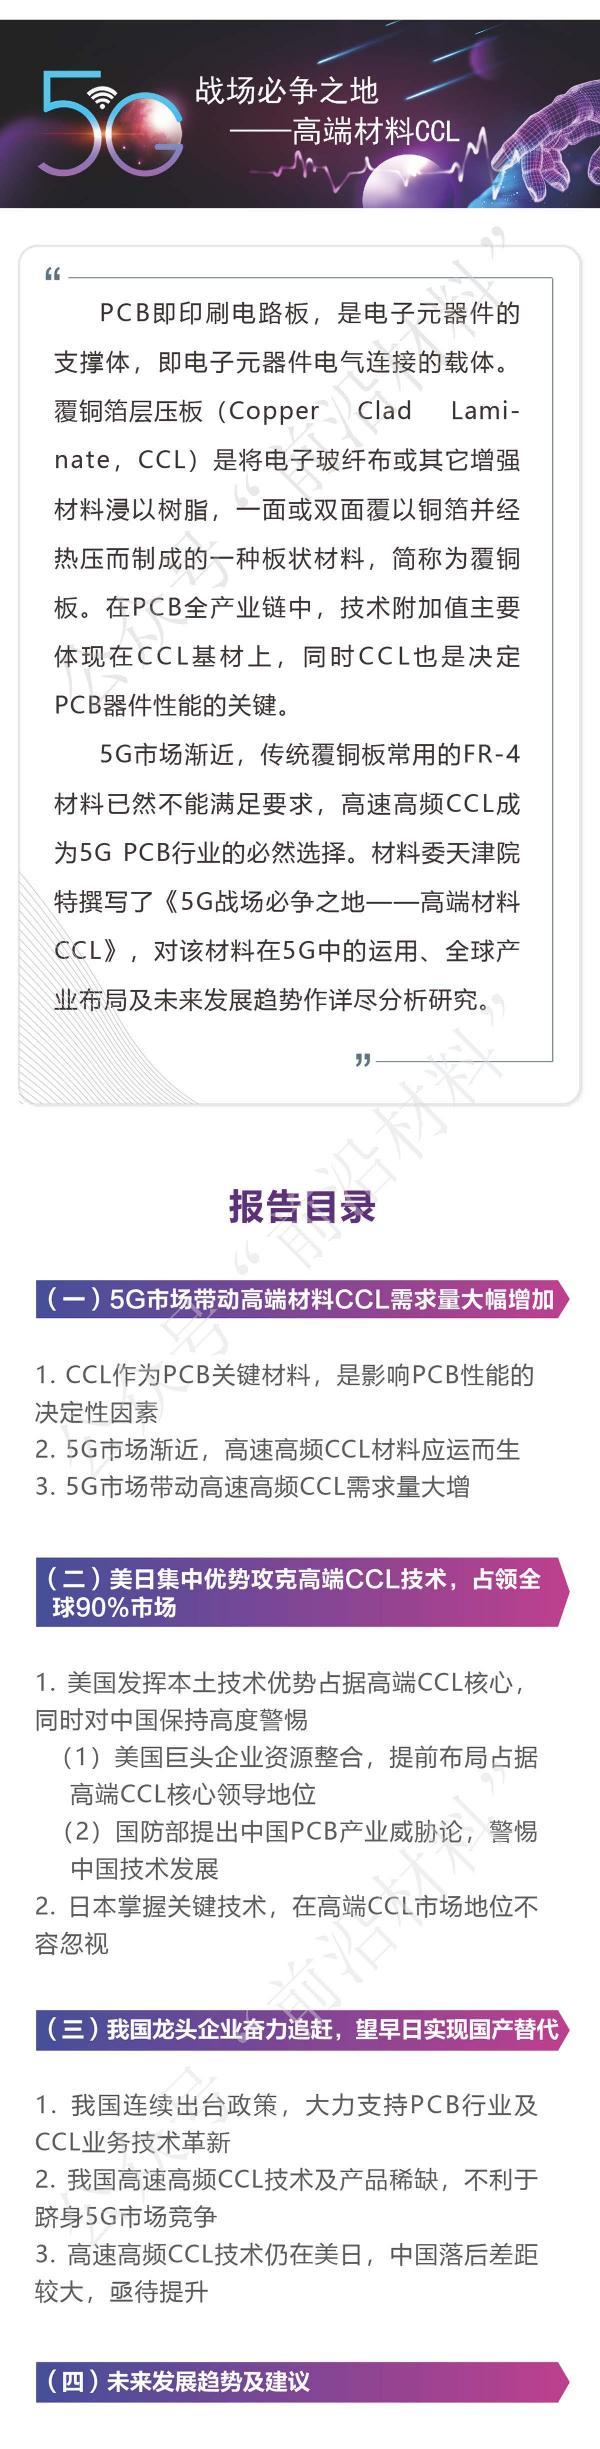 5G战场必争|PCB产业高端材料CCL全球技术分析报告